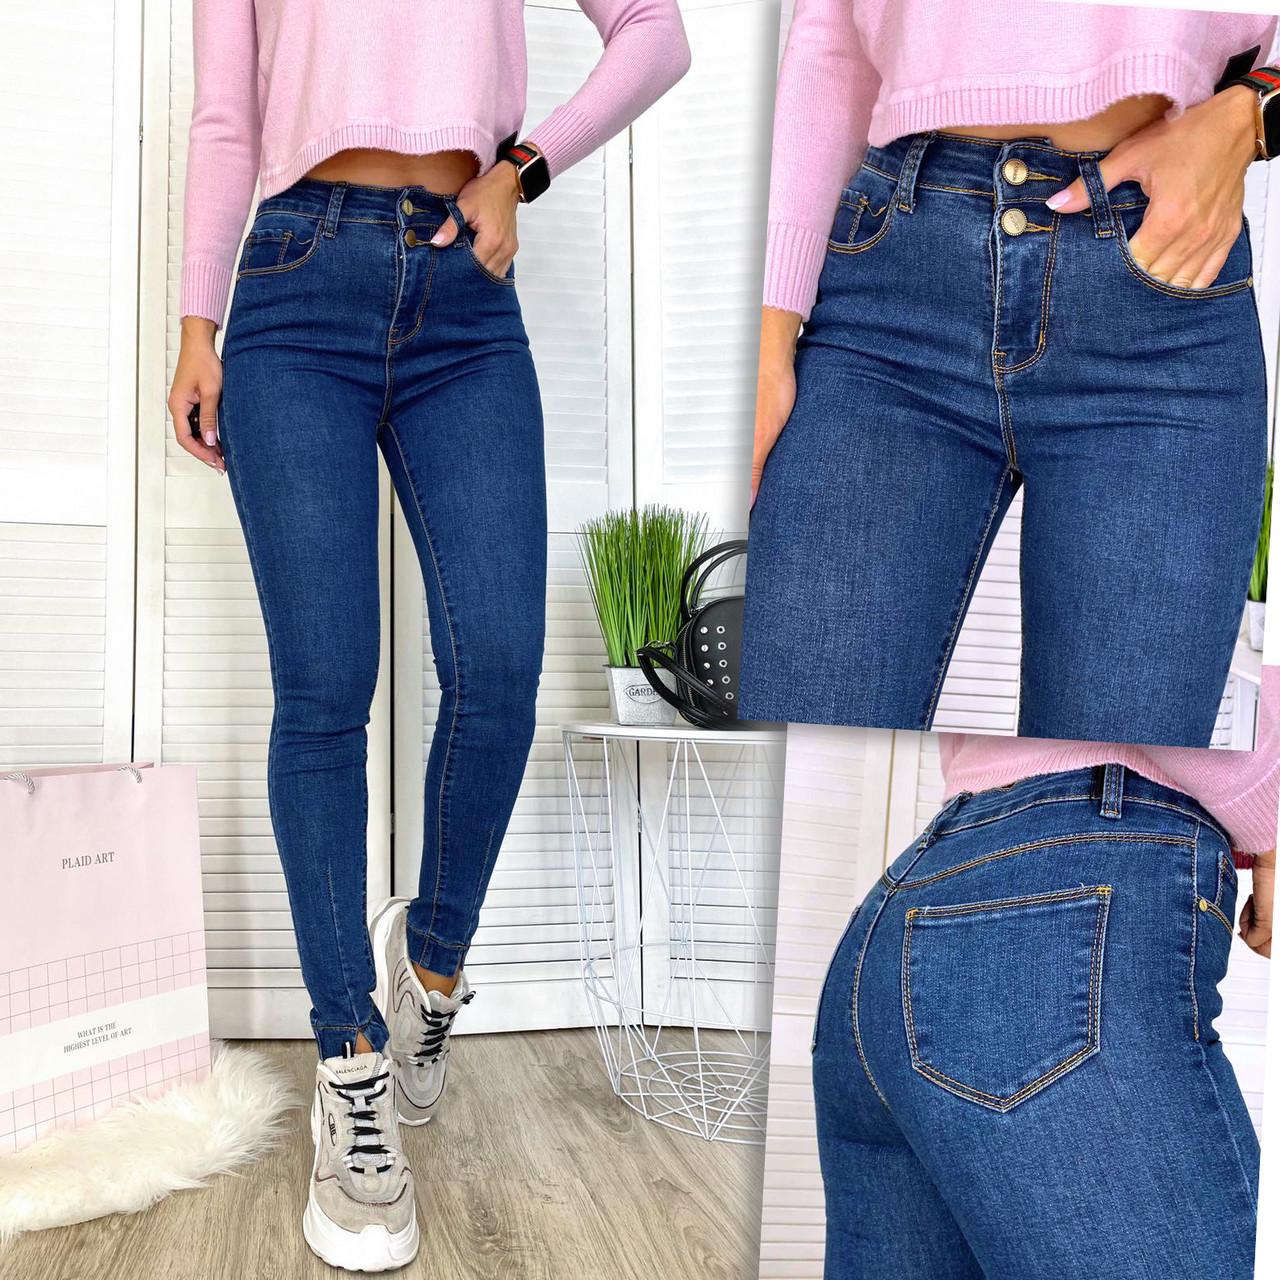 Американка синяя New jeans 0530